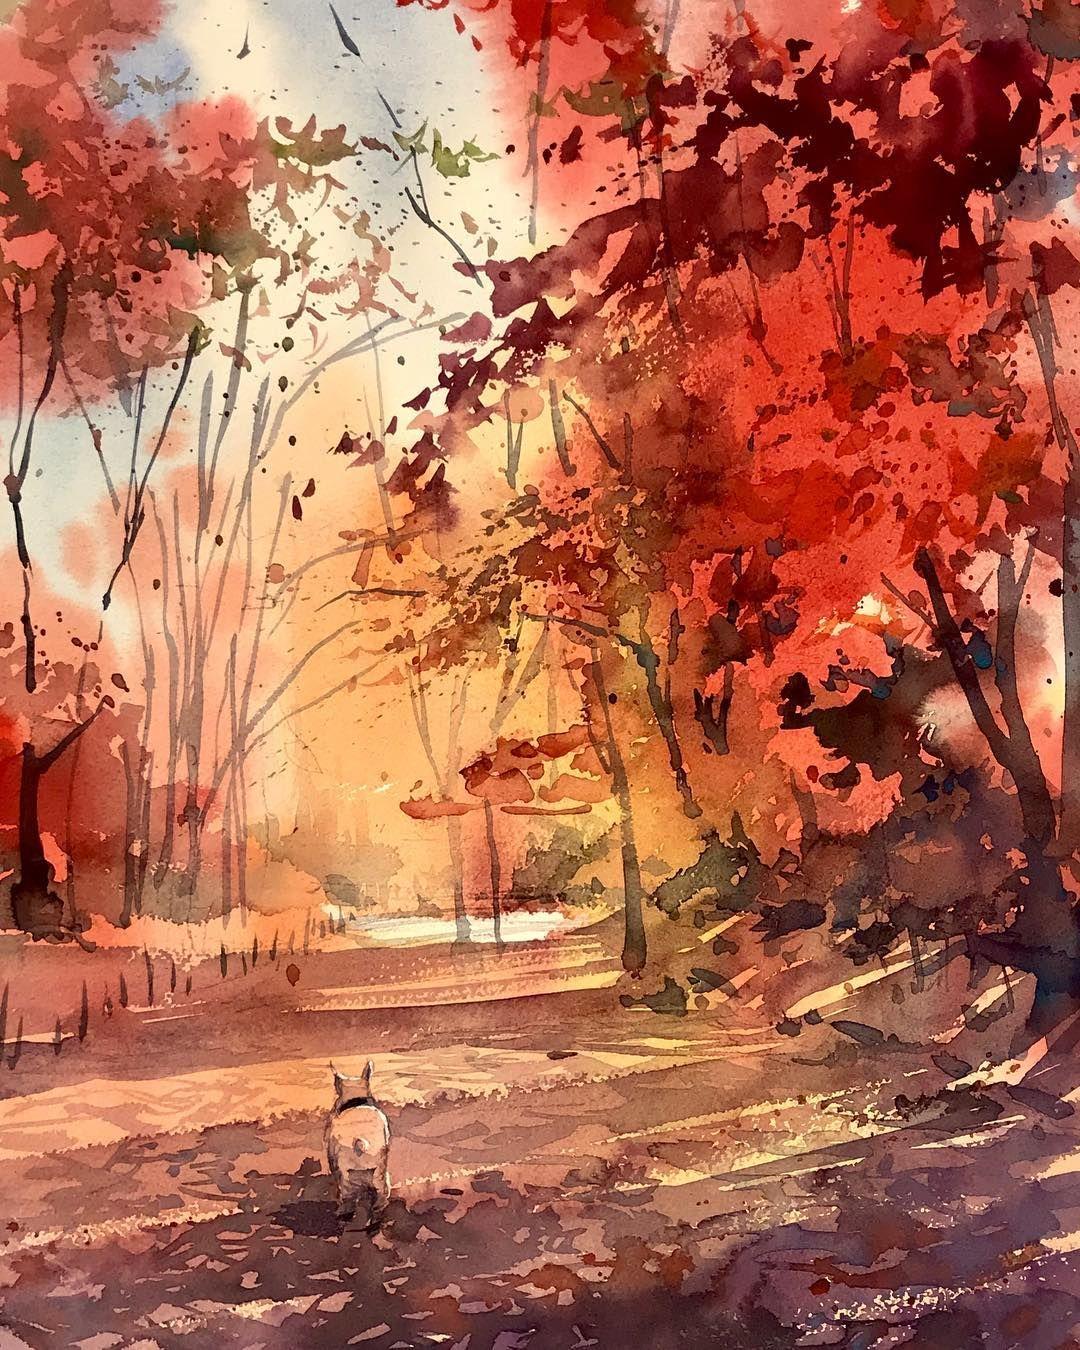 Into The Red In Japan Yokohama Watercolor Japan Color Landscape Kazuokasai Apache Red Yellow Coloredleaves Sketch Park Malarstwo Akwarele Obrazy